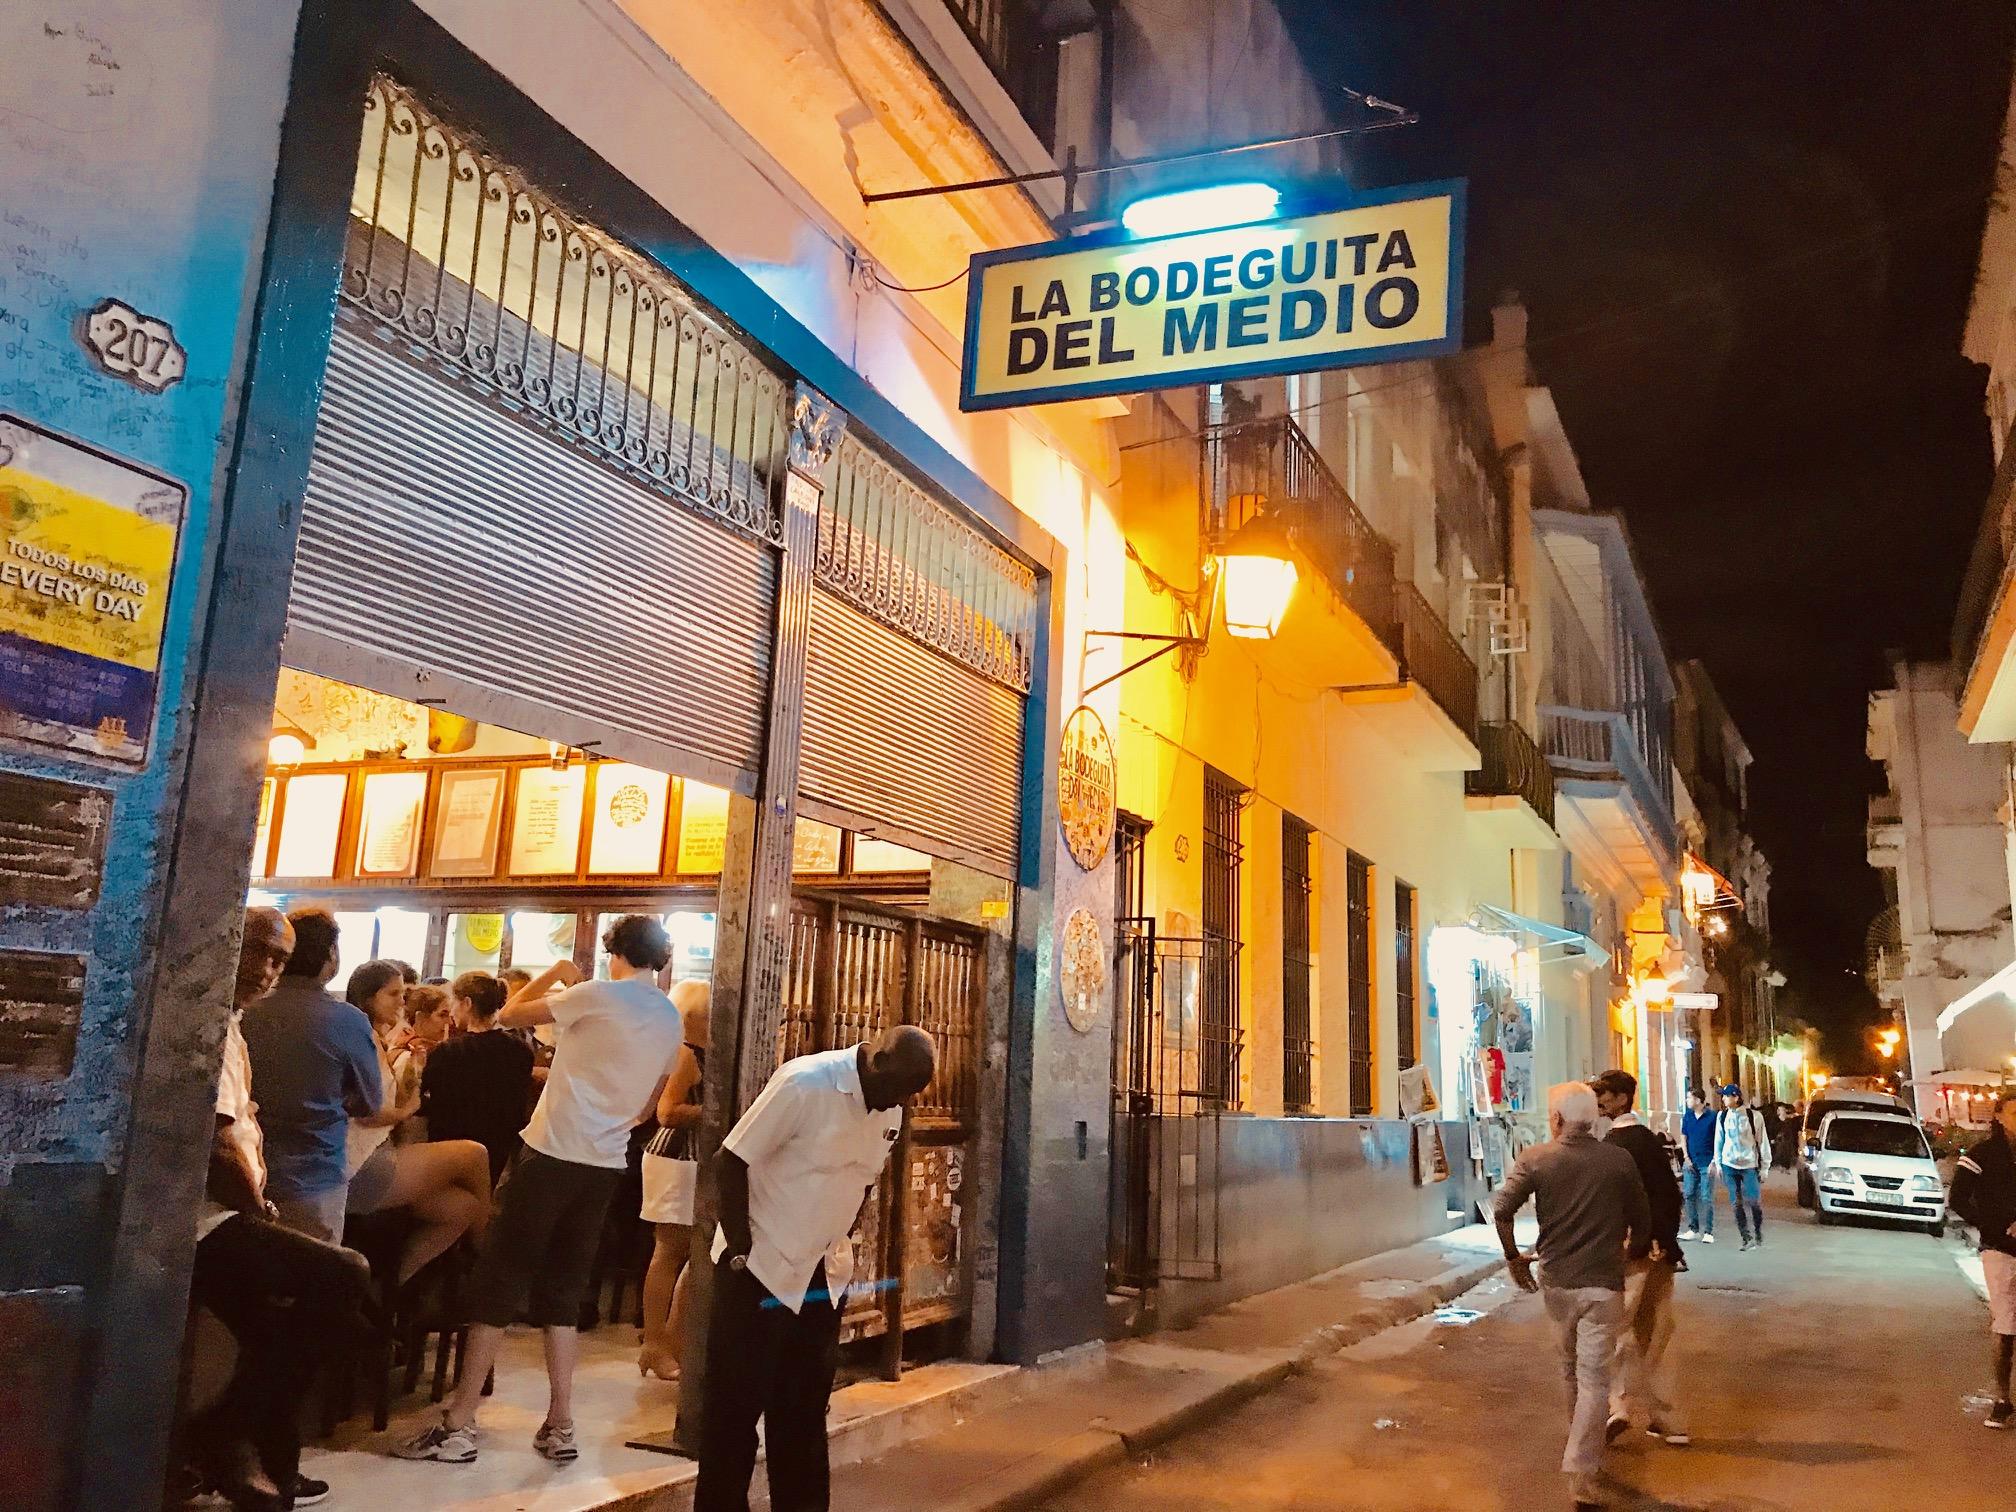 Cuba Bodeguita 2